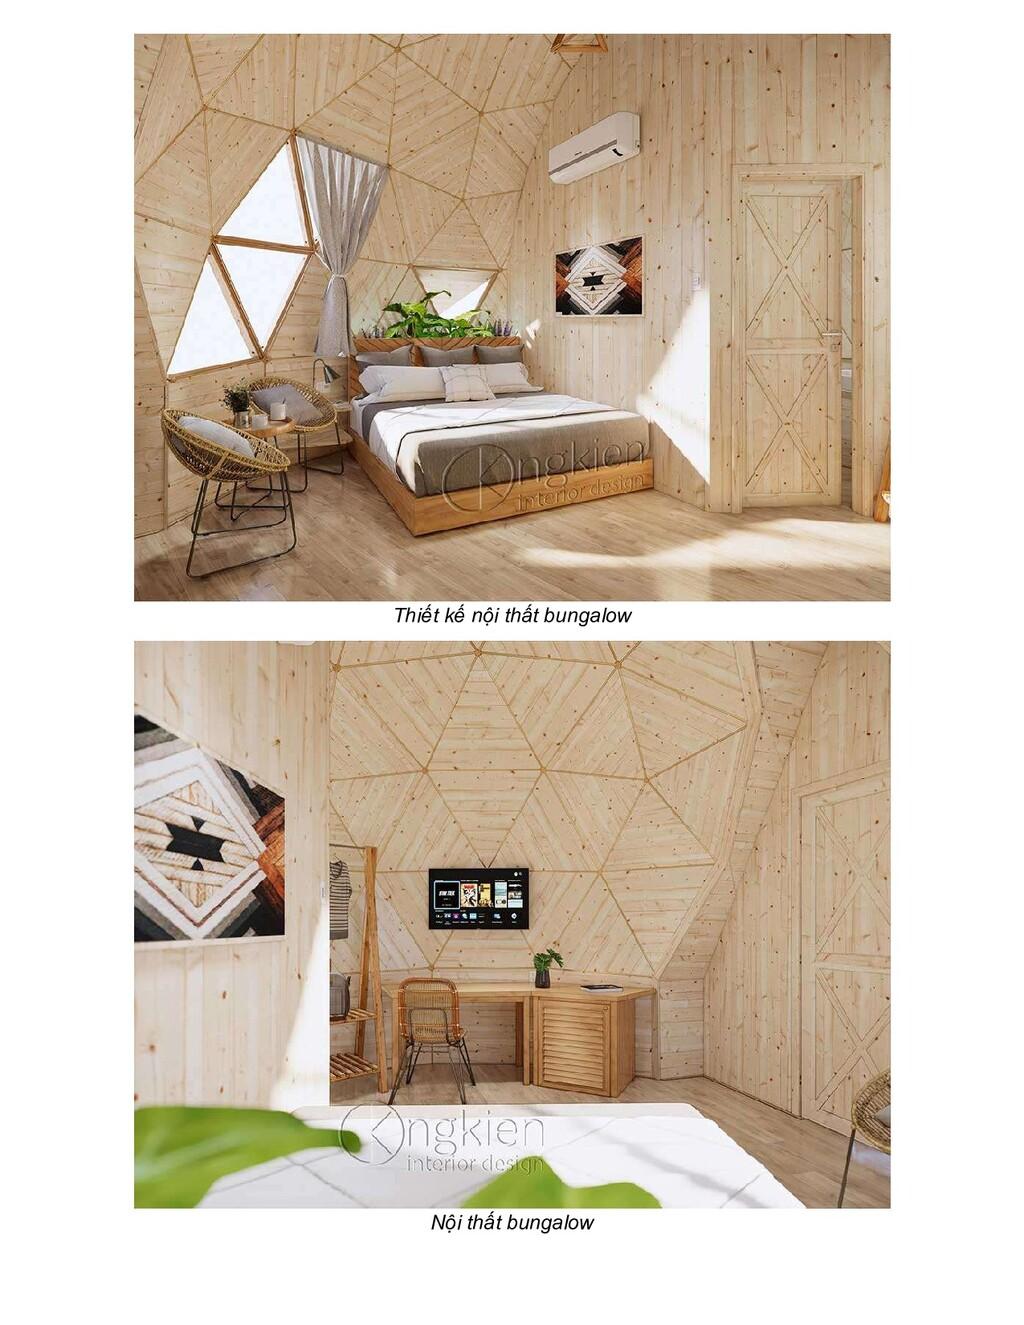 Thiết kế nội thất bungalow Nội thất bungalow